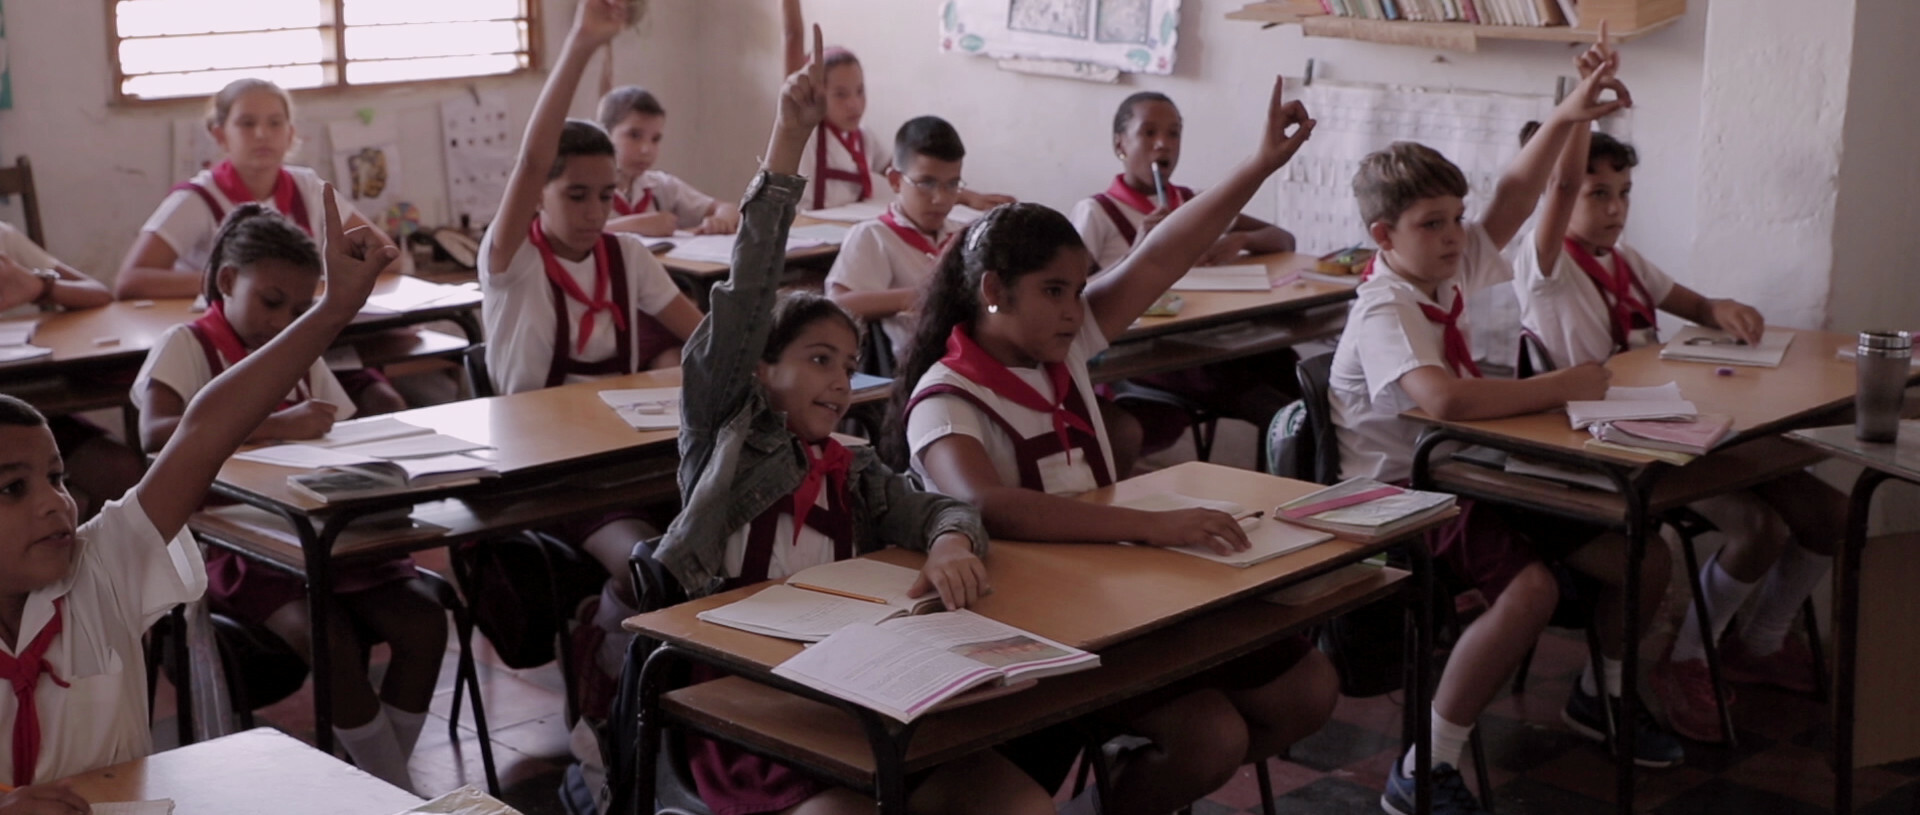 Mostra Internacional de Films de Dones: Documentalistes llatinoamericanes